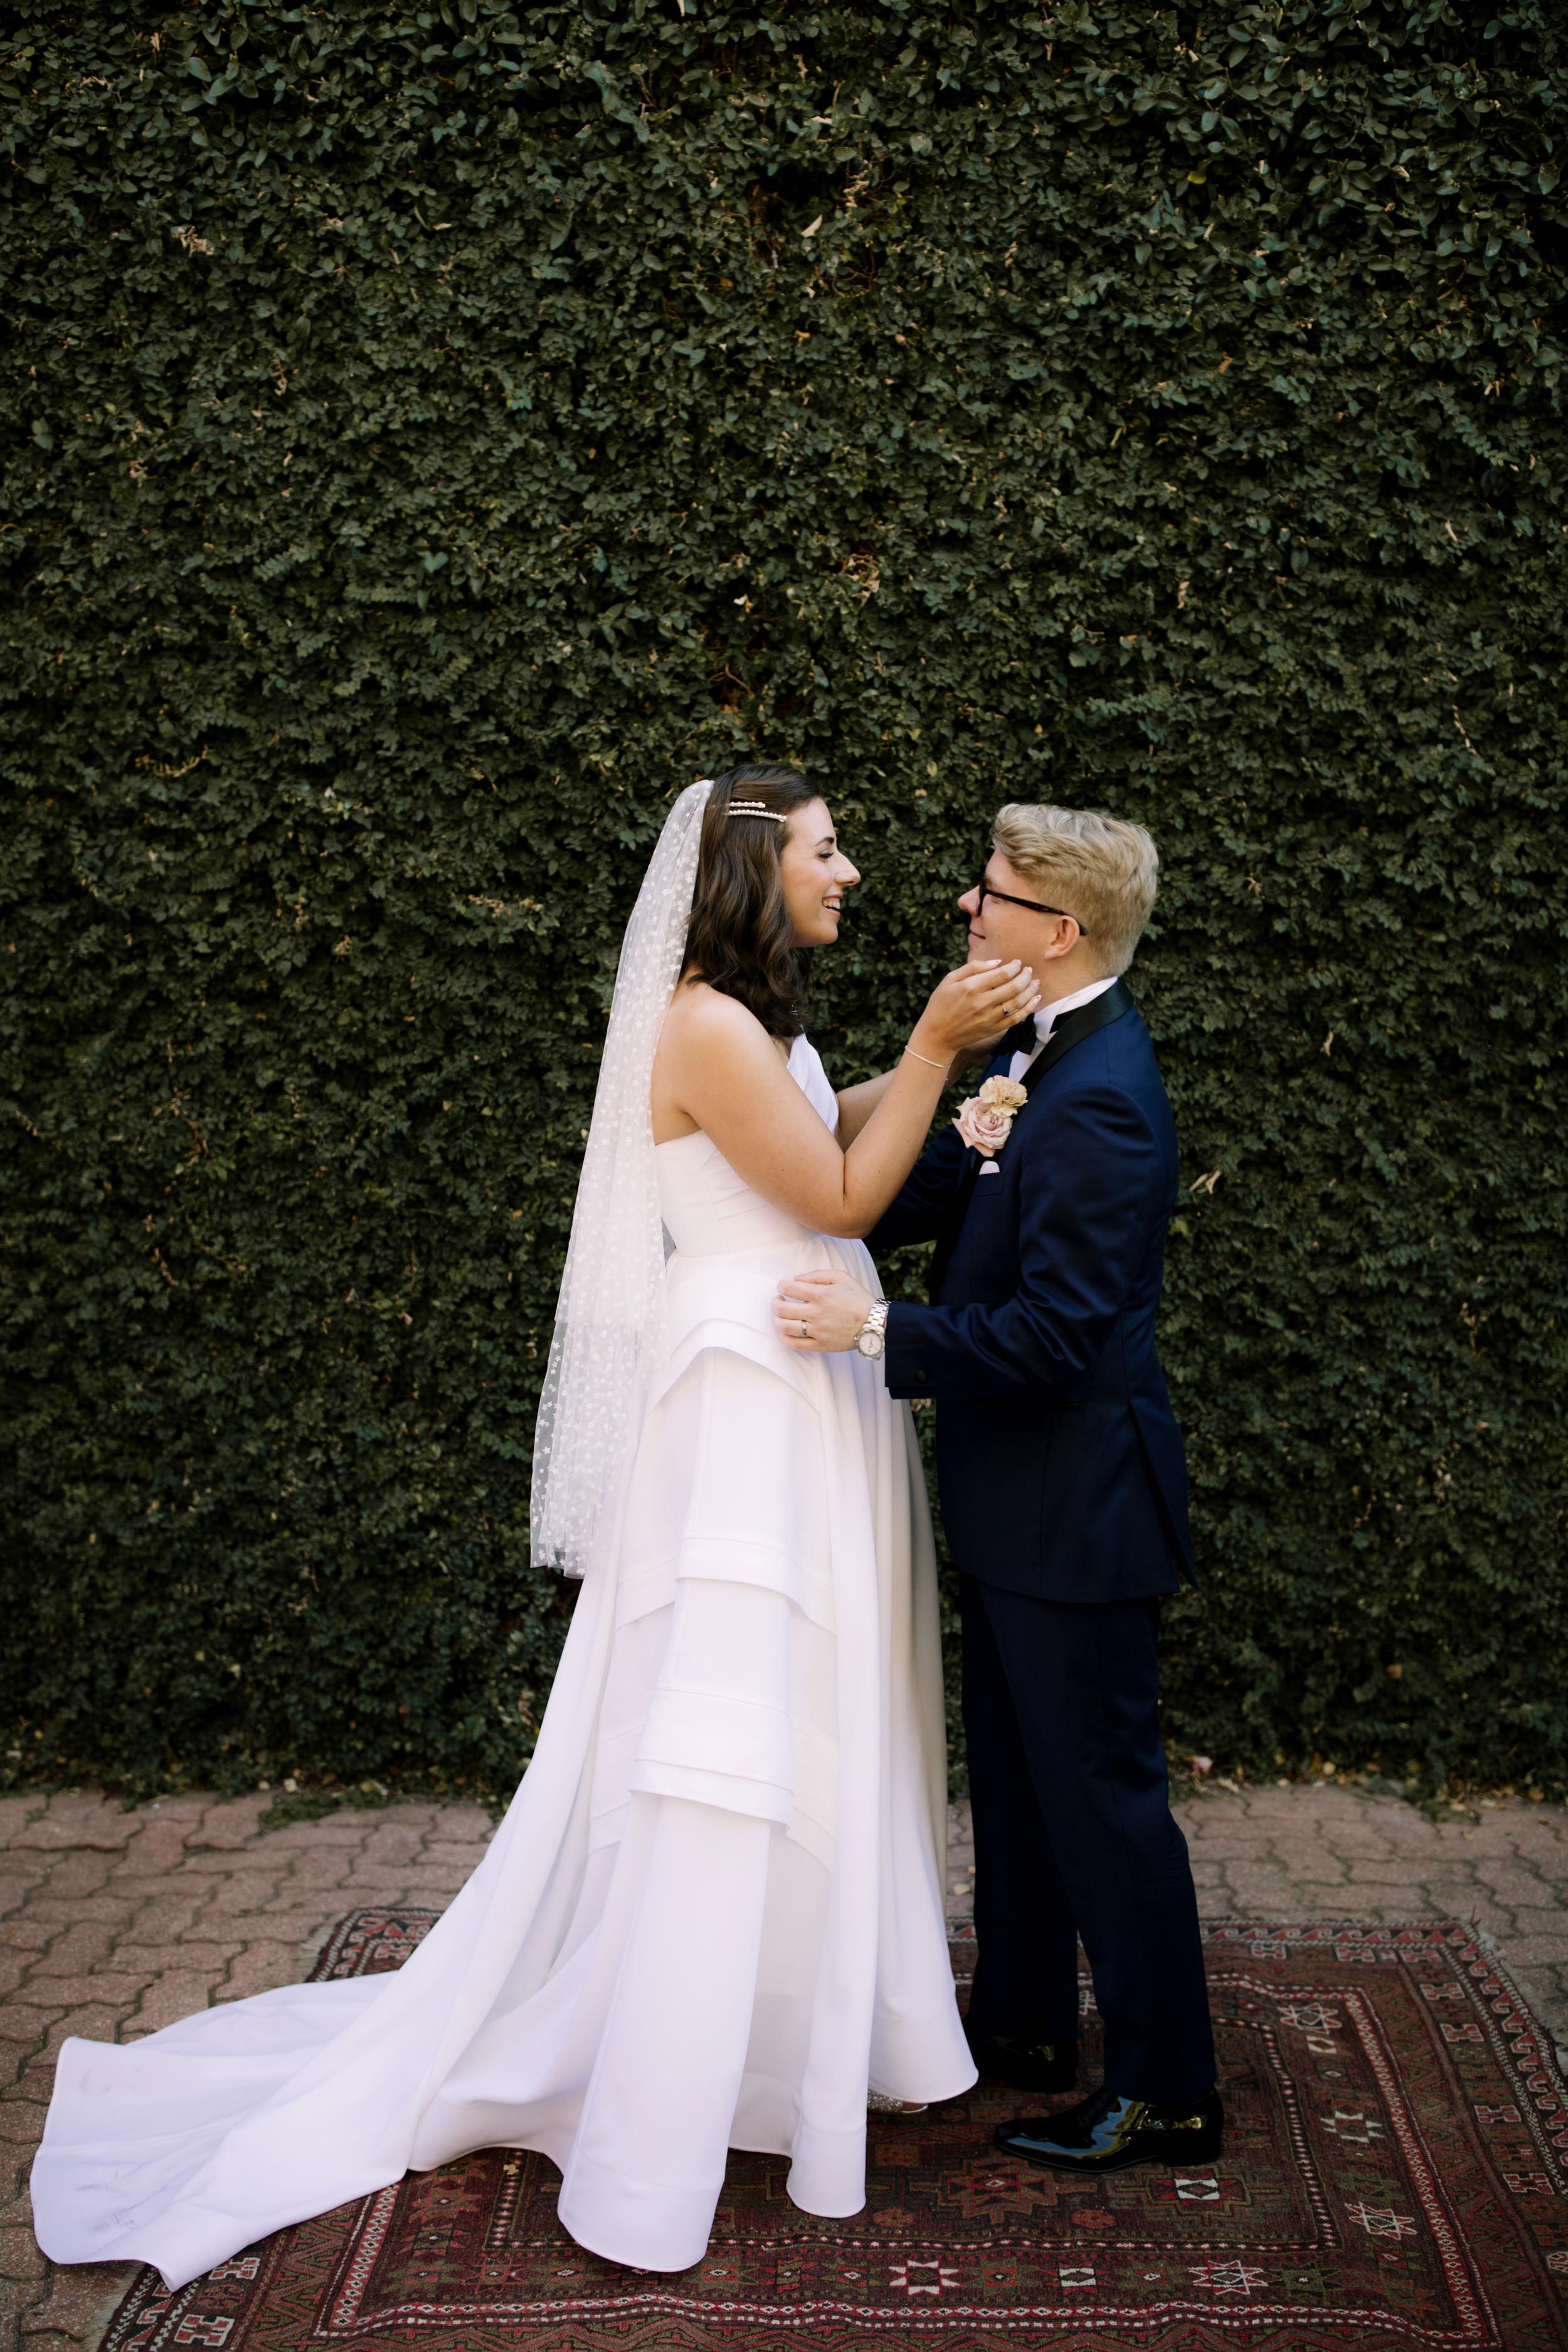 I-Got-You-Babe-Weddings-Tahlia&Mitch-Butler-Lane-Wedding0106.JPG